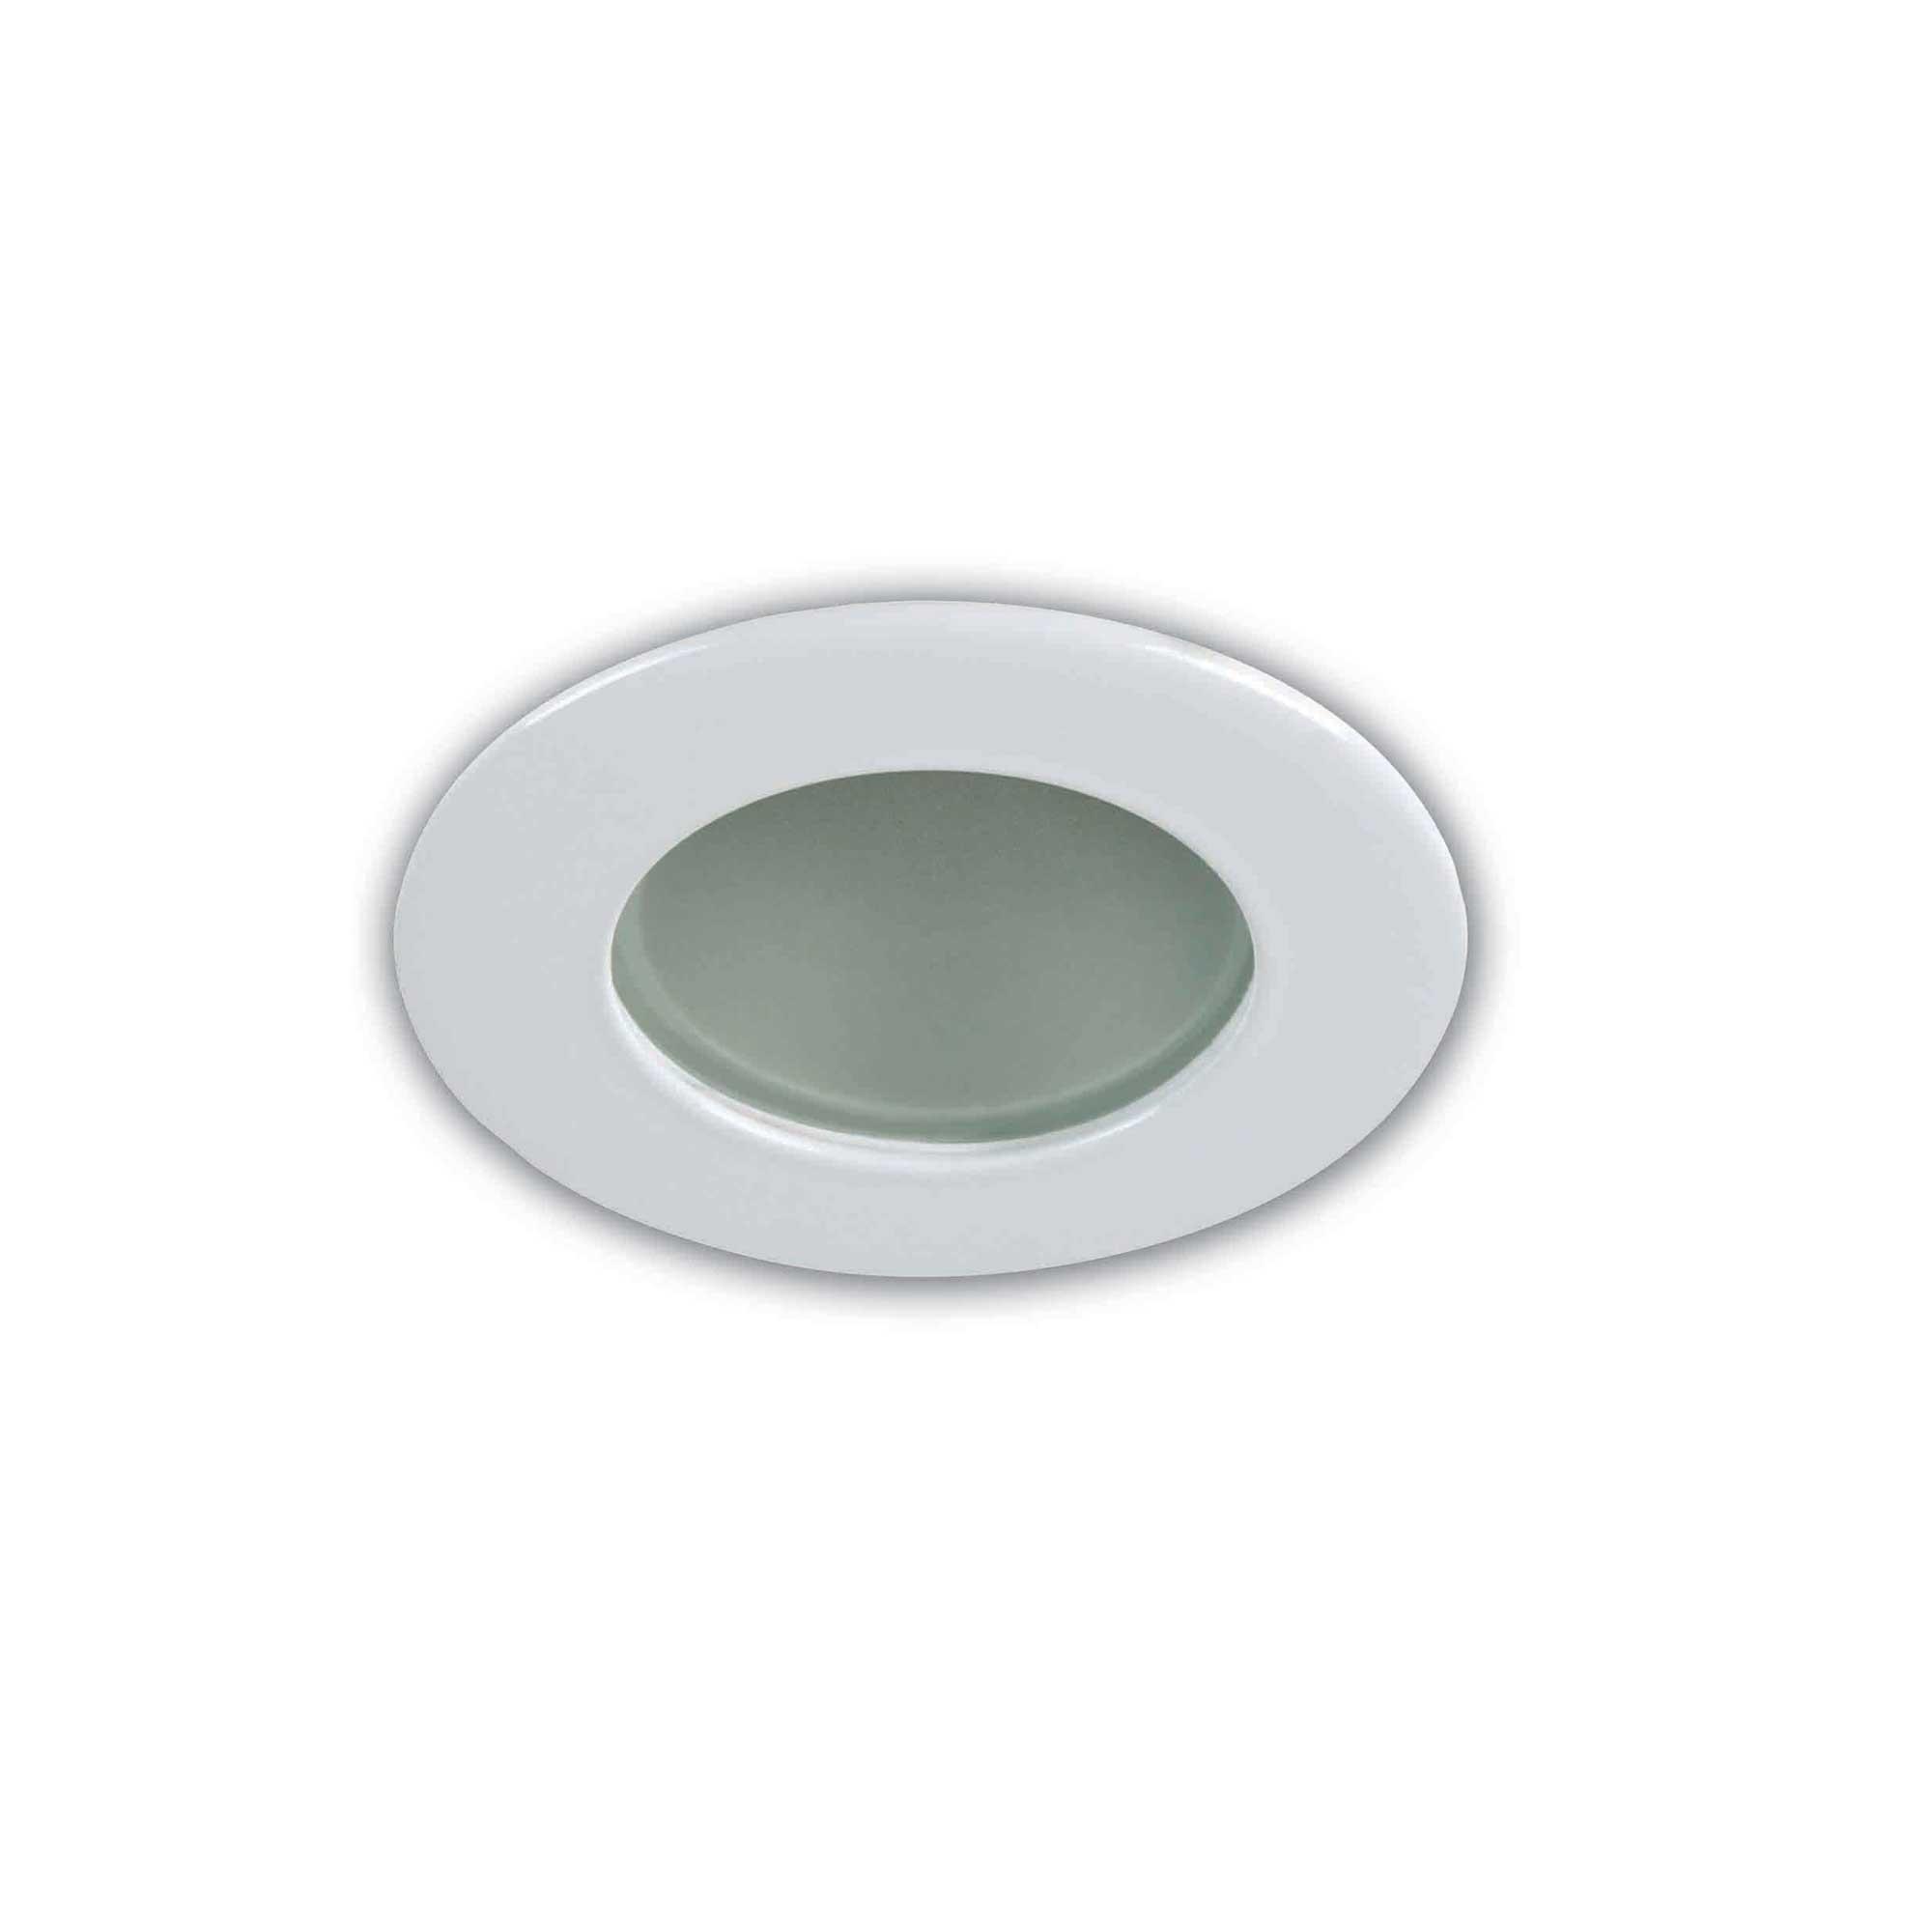 3.5 Inch MR16 Lensed Shower Trim by Priori   X3501-01